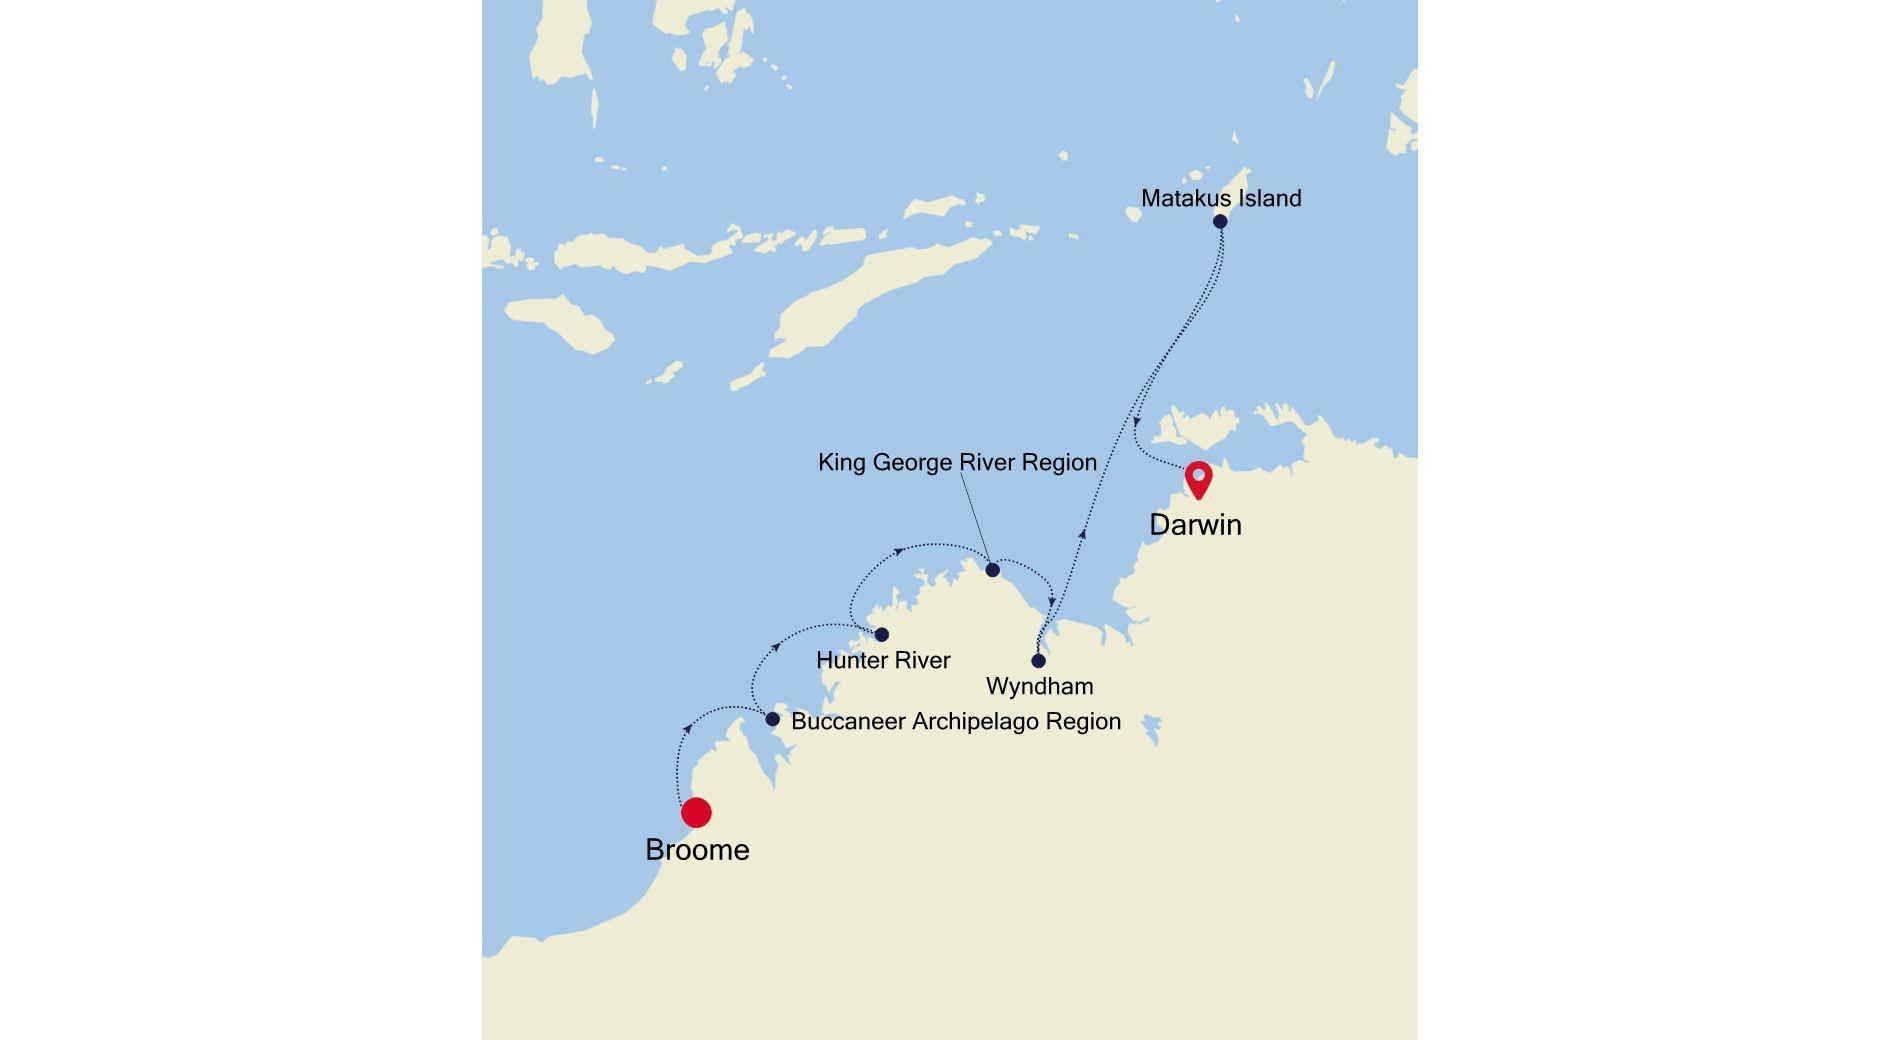 E1210803010 - Broome à Darwin